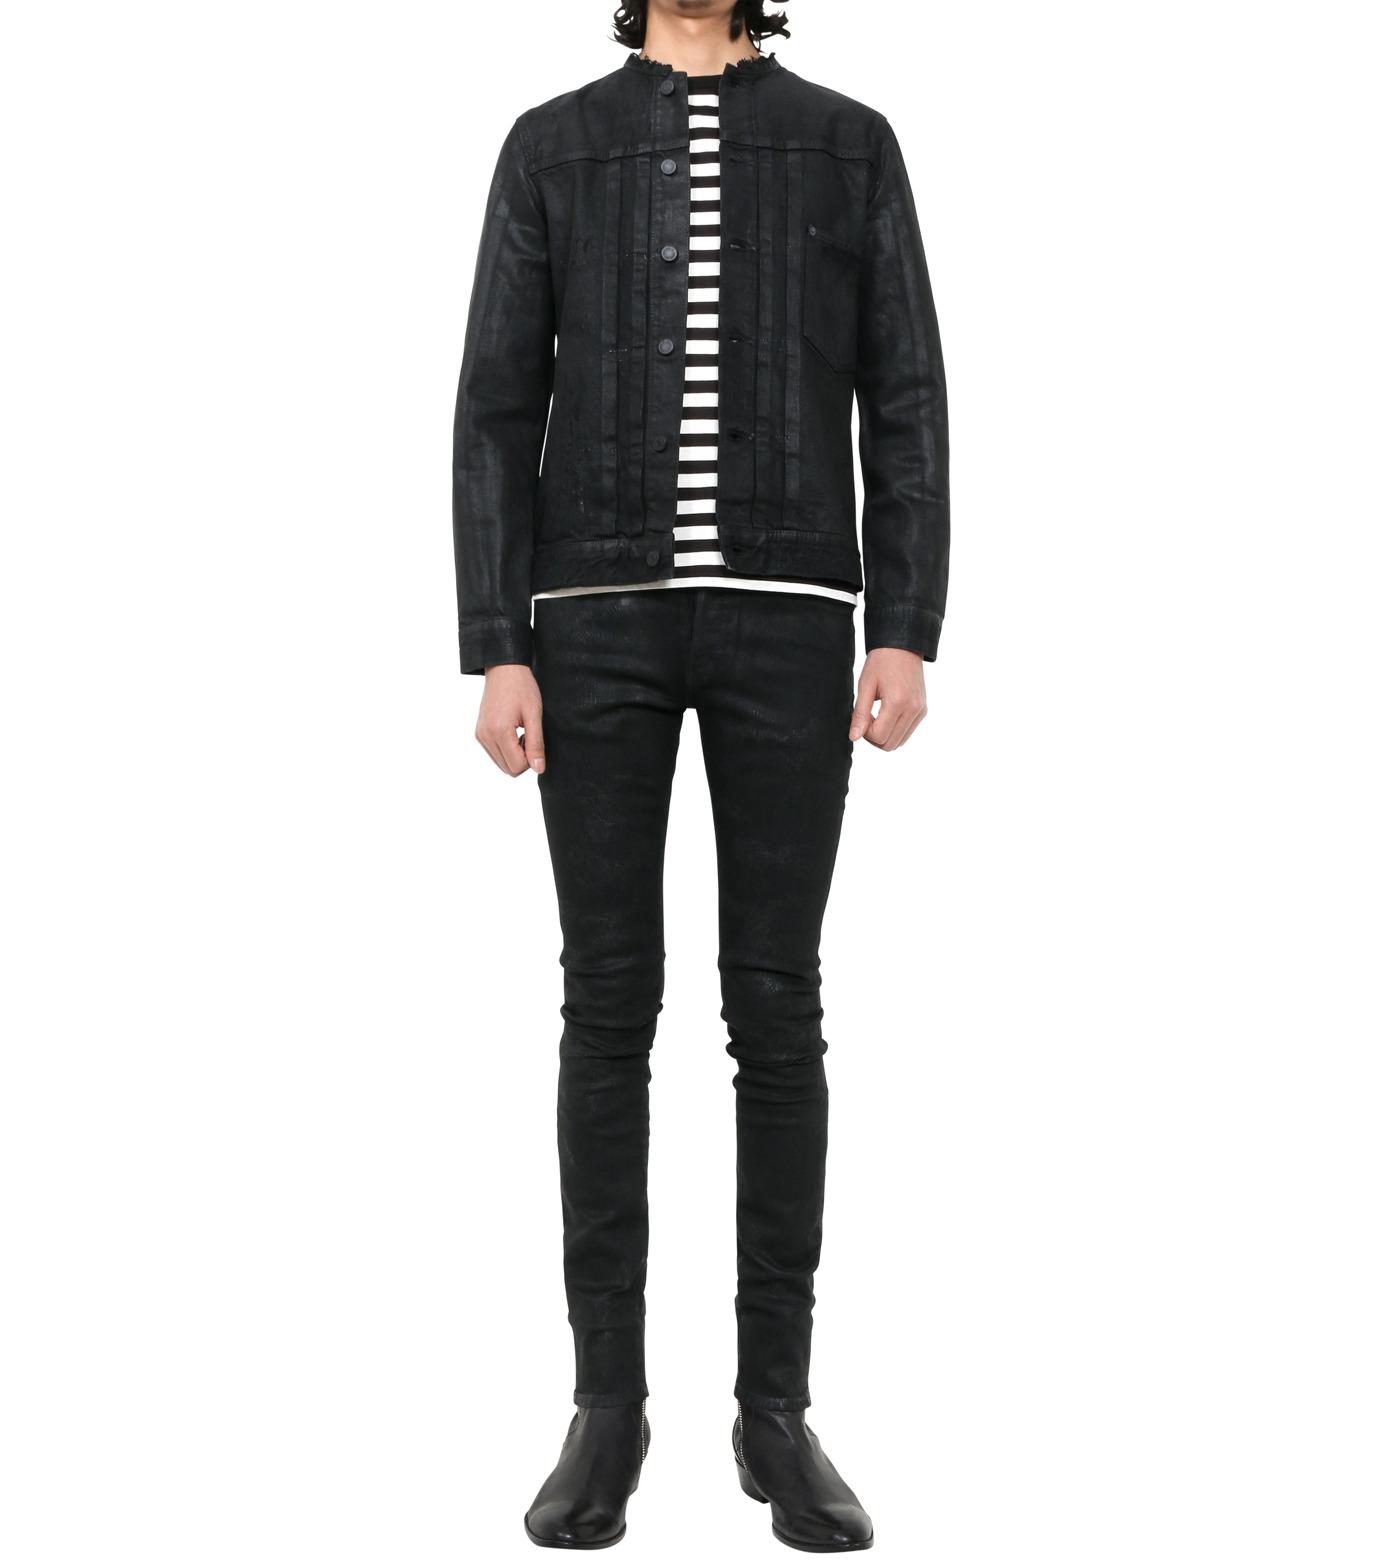 HL HEDDIE LOVU(エイチエル・エディールーヴ)のCOLLARLESS DENIM JACKET-BLACK(ジャケット/jacket)-18S94007-13 拡大詳細画像1